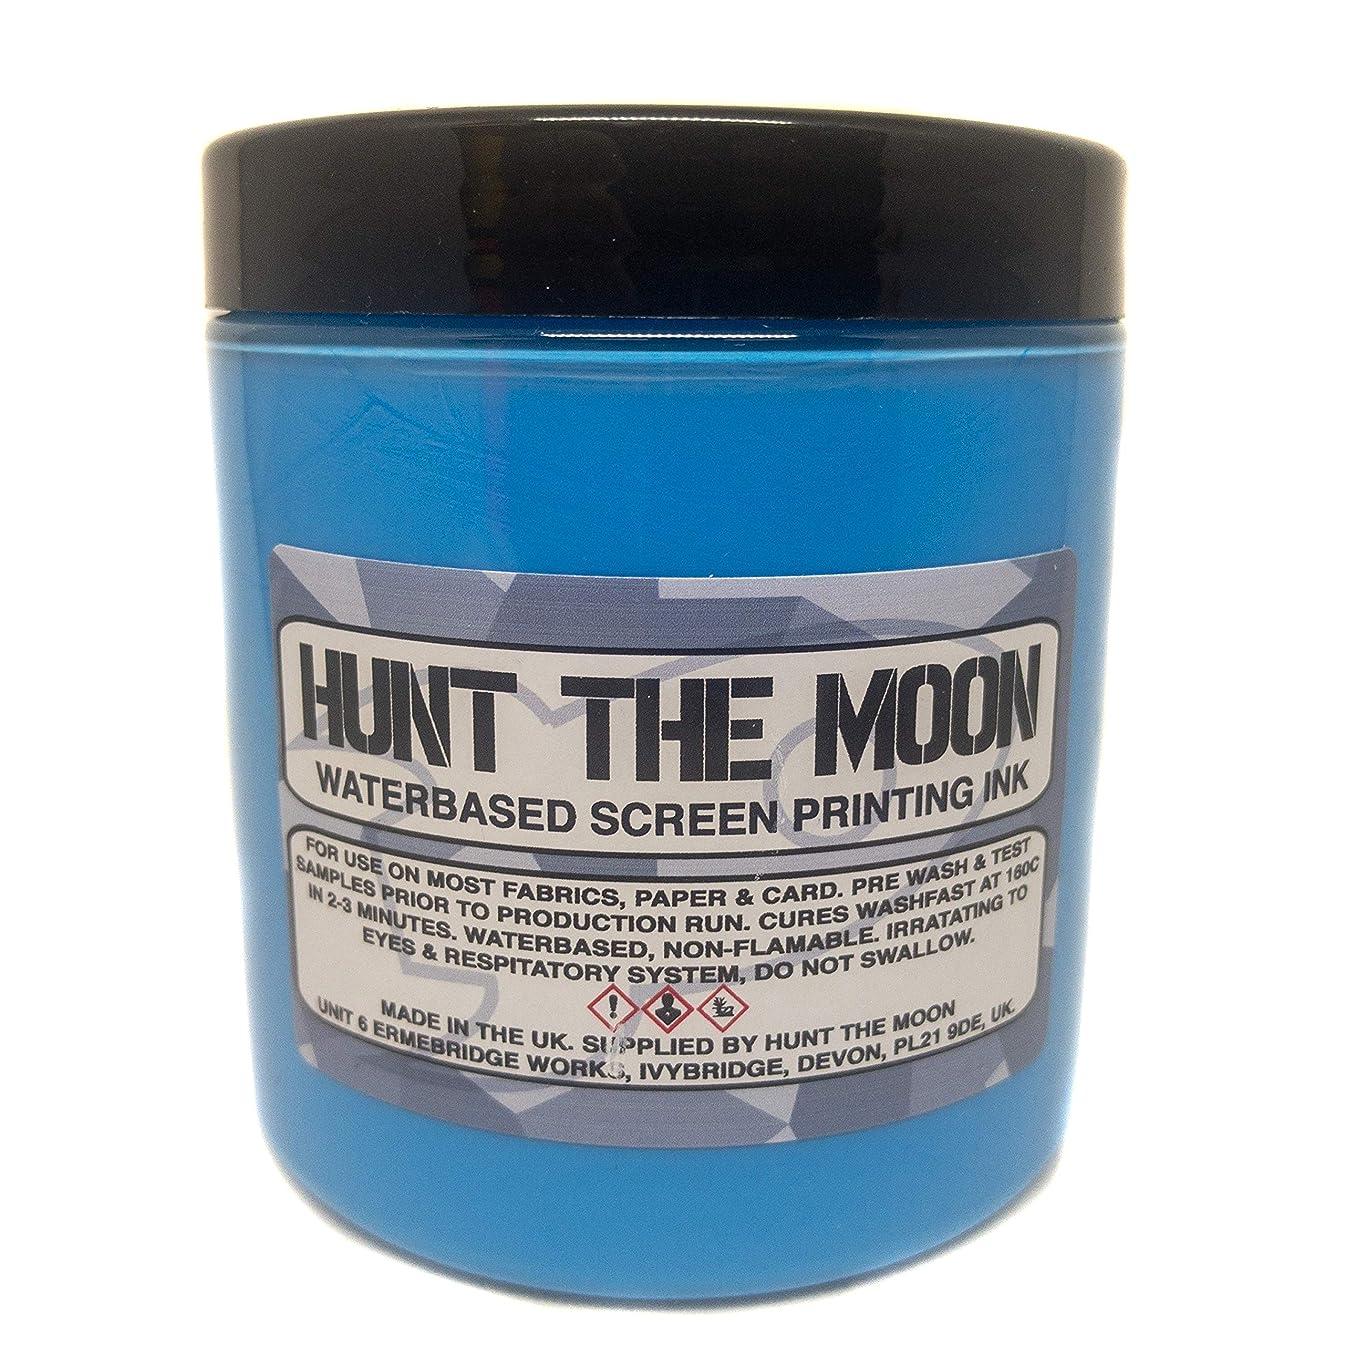 Hunt The Moon Water Based Screen Printing Ink, Ibiza Blue, 240ml